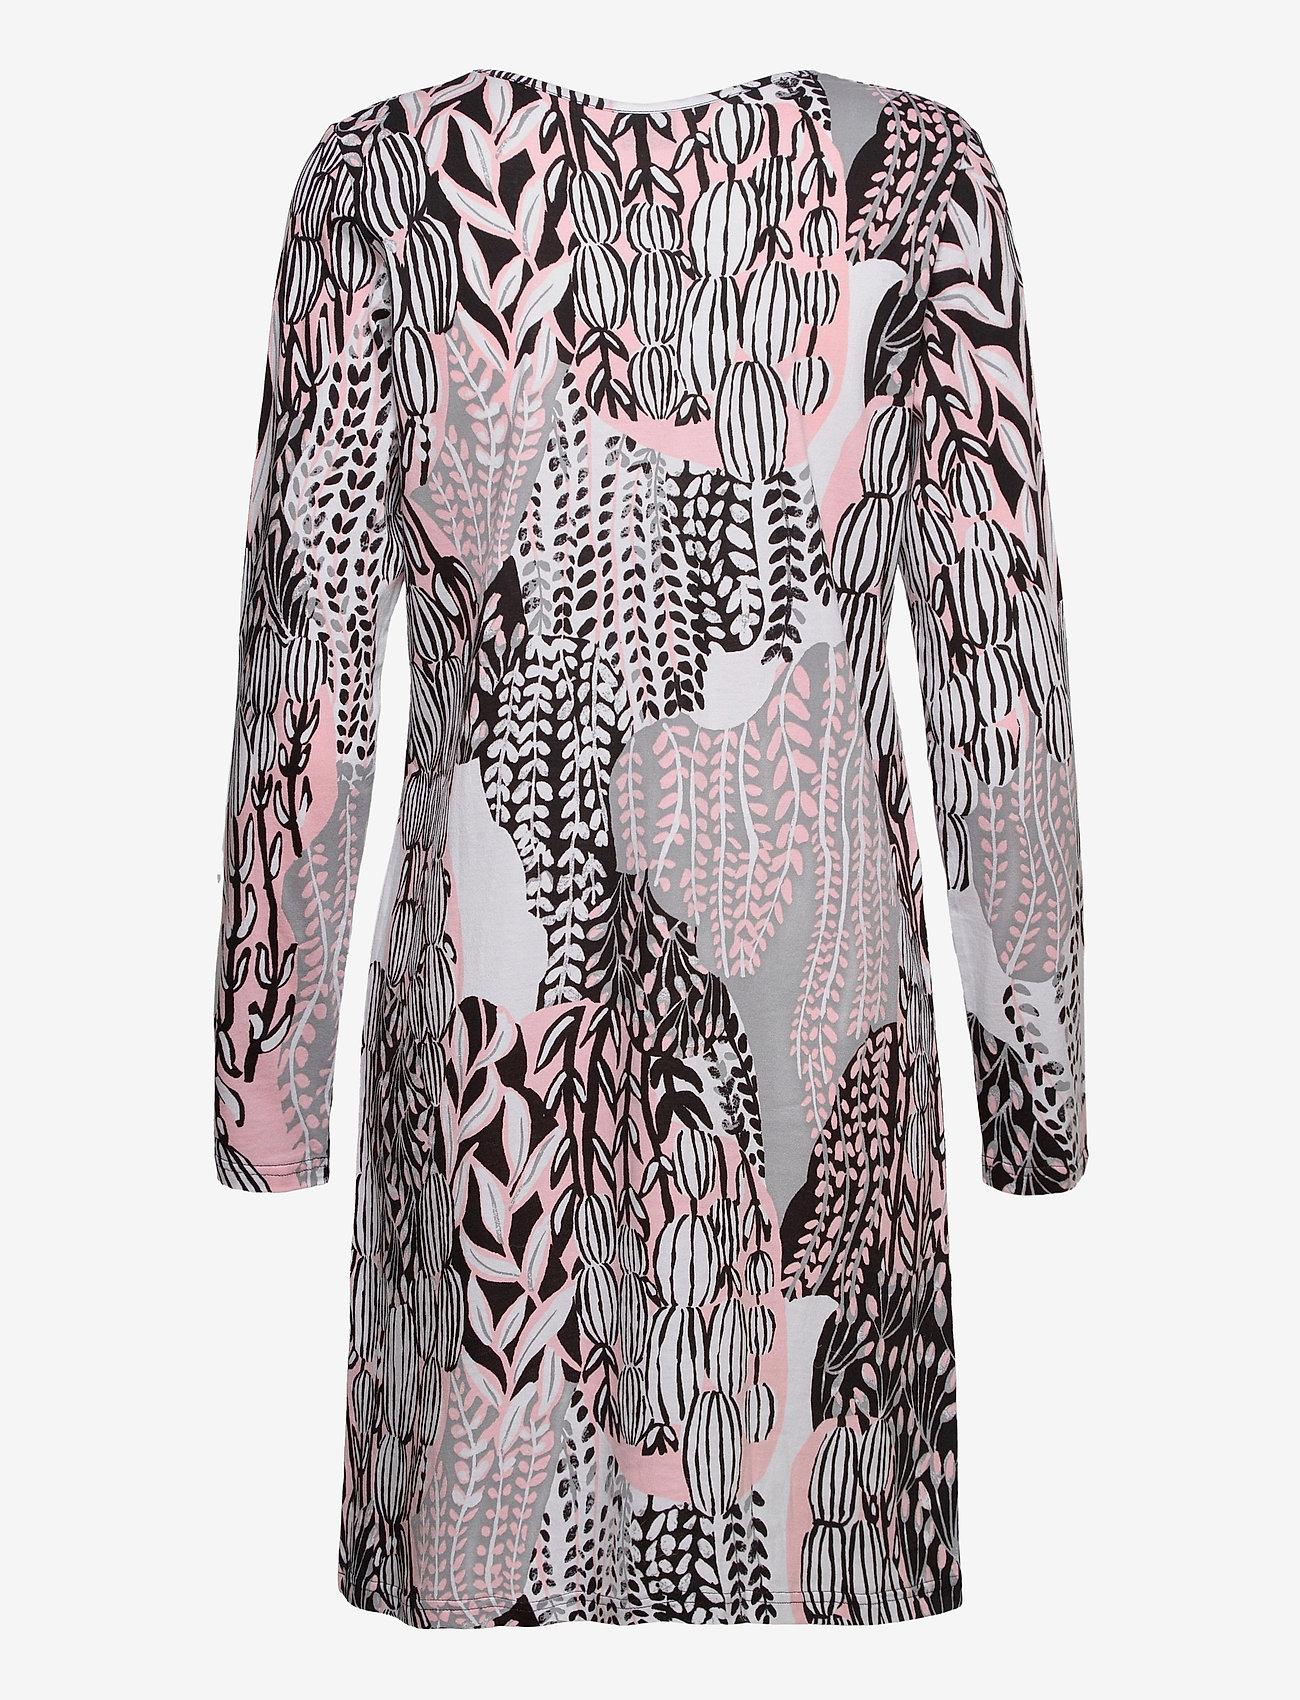 Nanso - Ladies big shirt, Suurennuslasi - nightdresses - light pink - 1